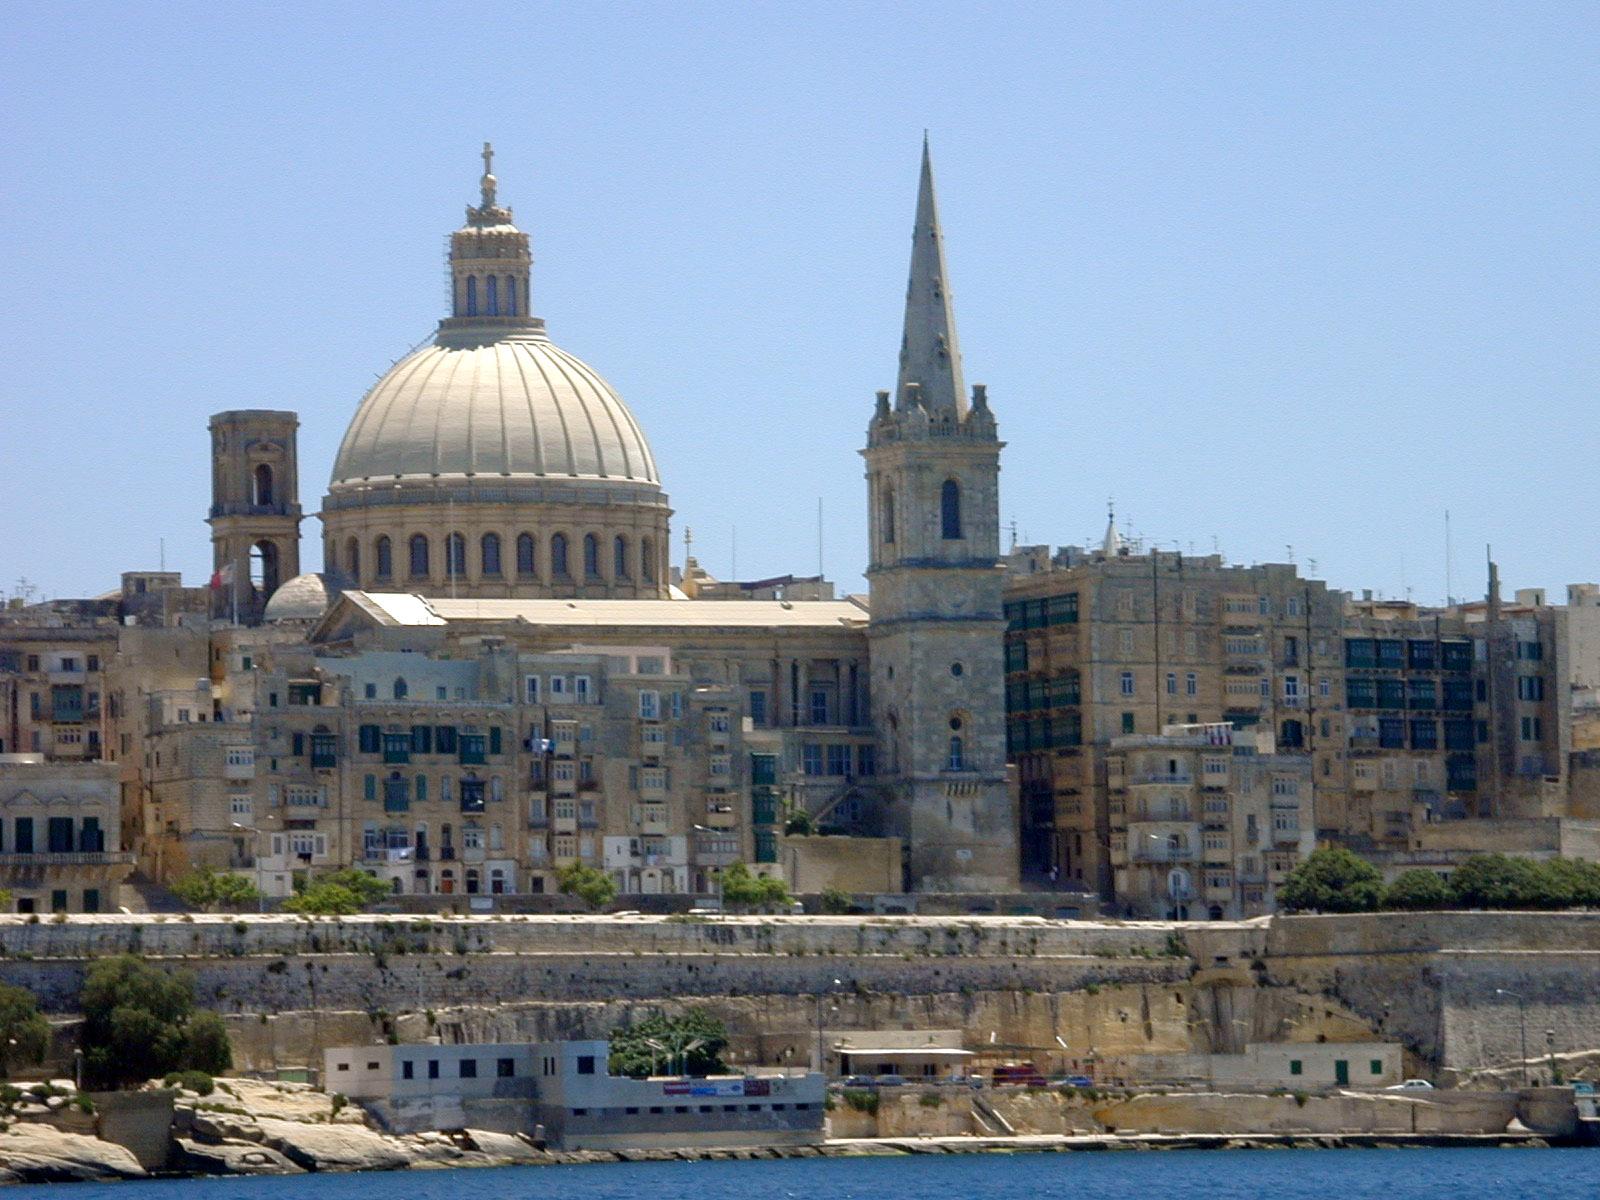 architecture exteriors city citadel cathedral mediteranean cityscape